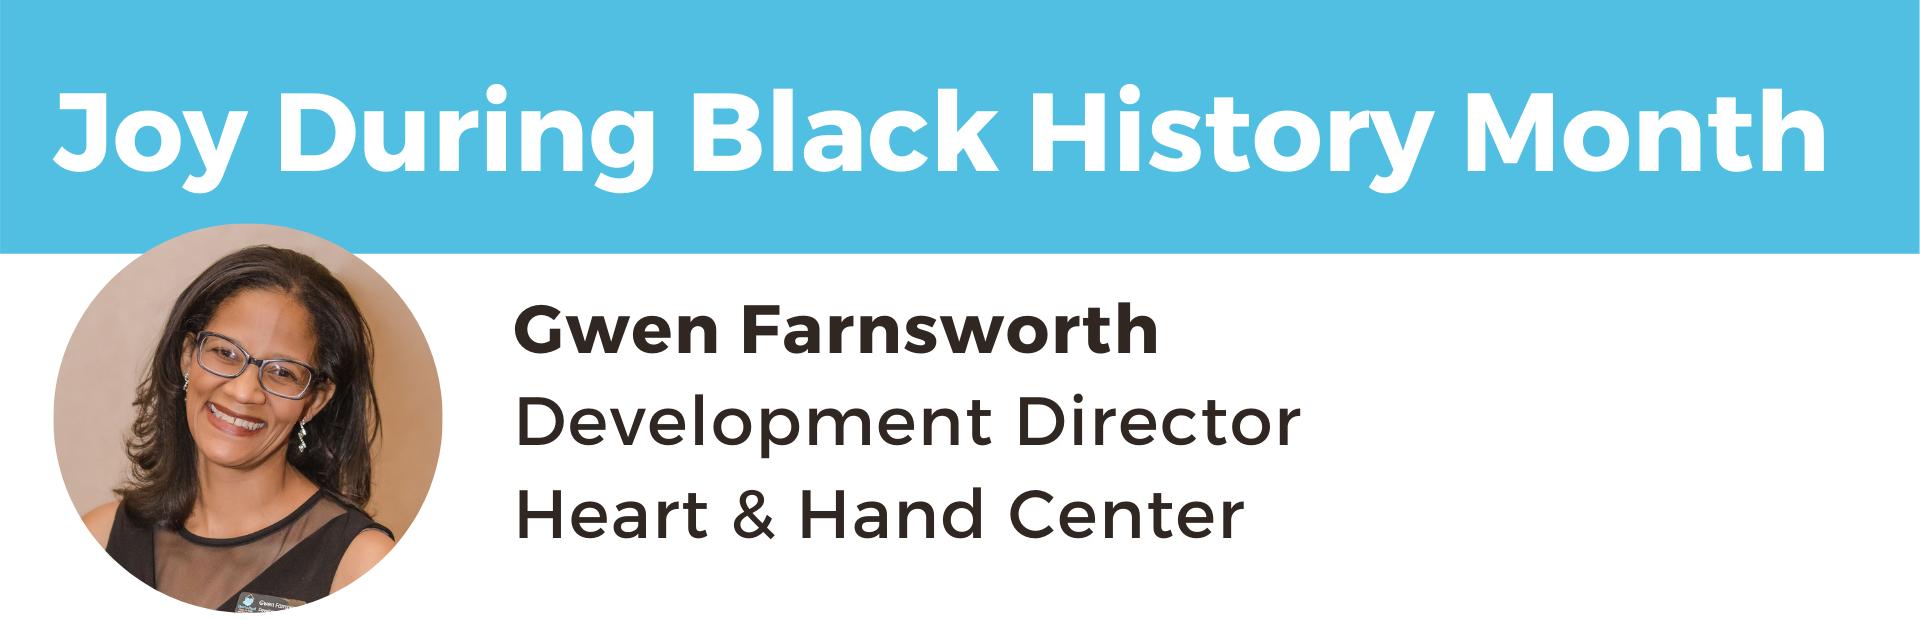 Celebrating Black History Month: Black Joy